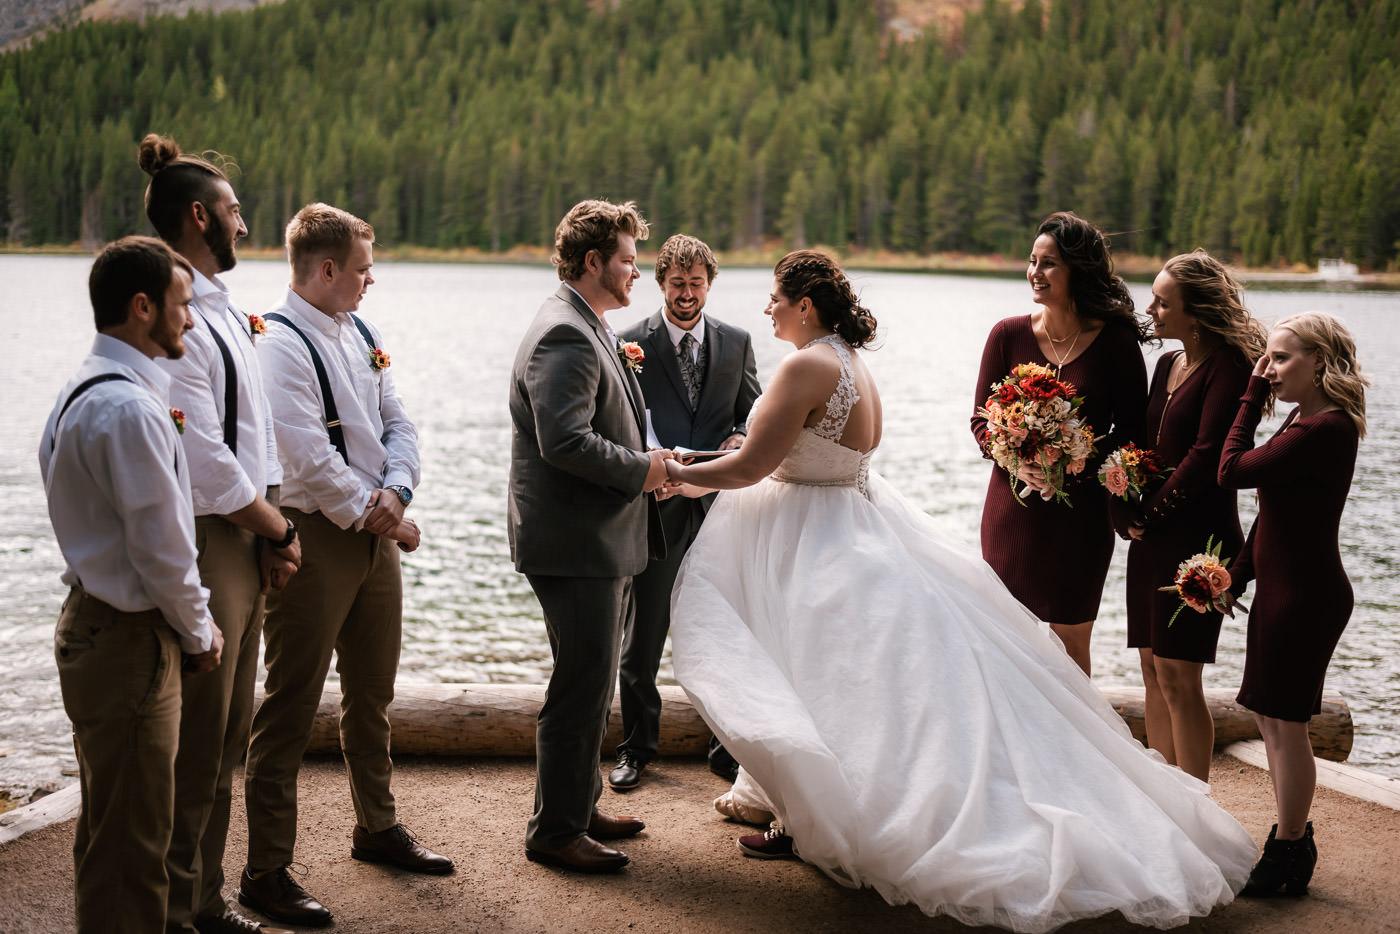 Montana elopement photographer captures magical lakeside wedding ceremony.